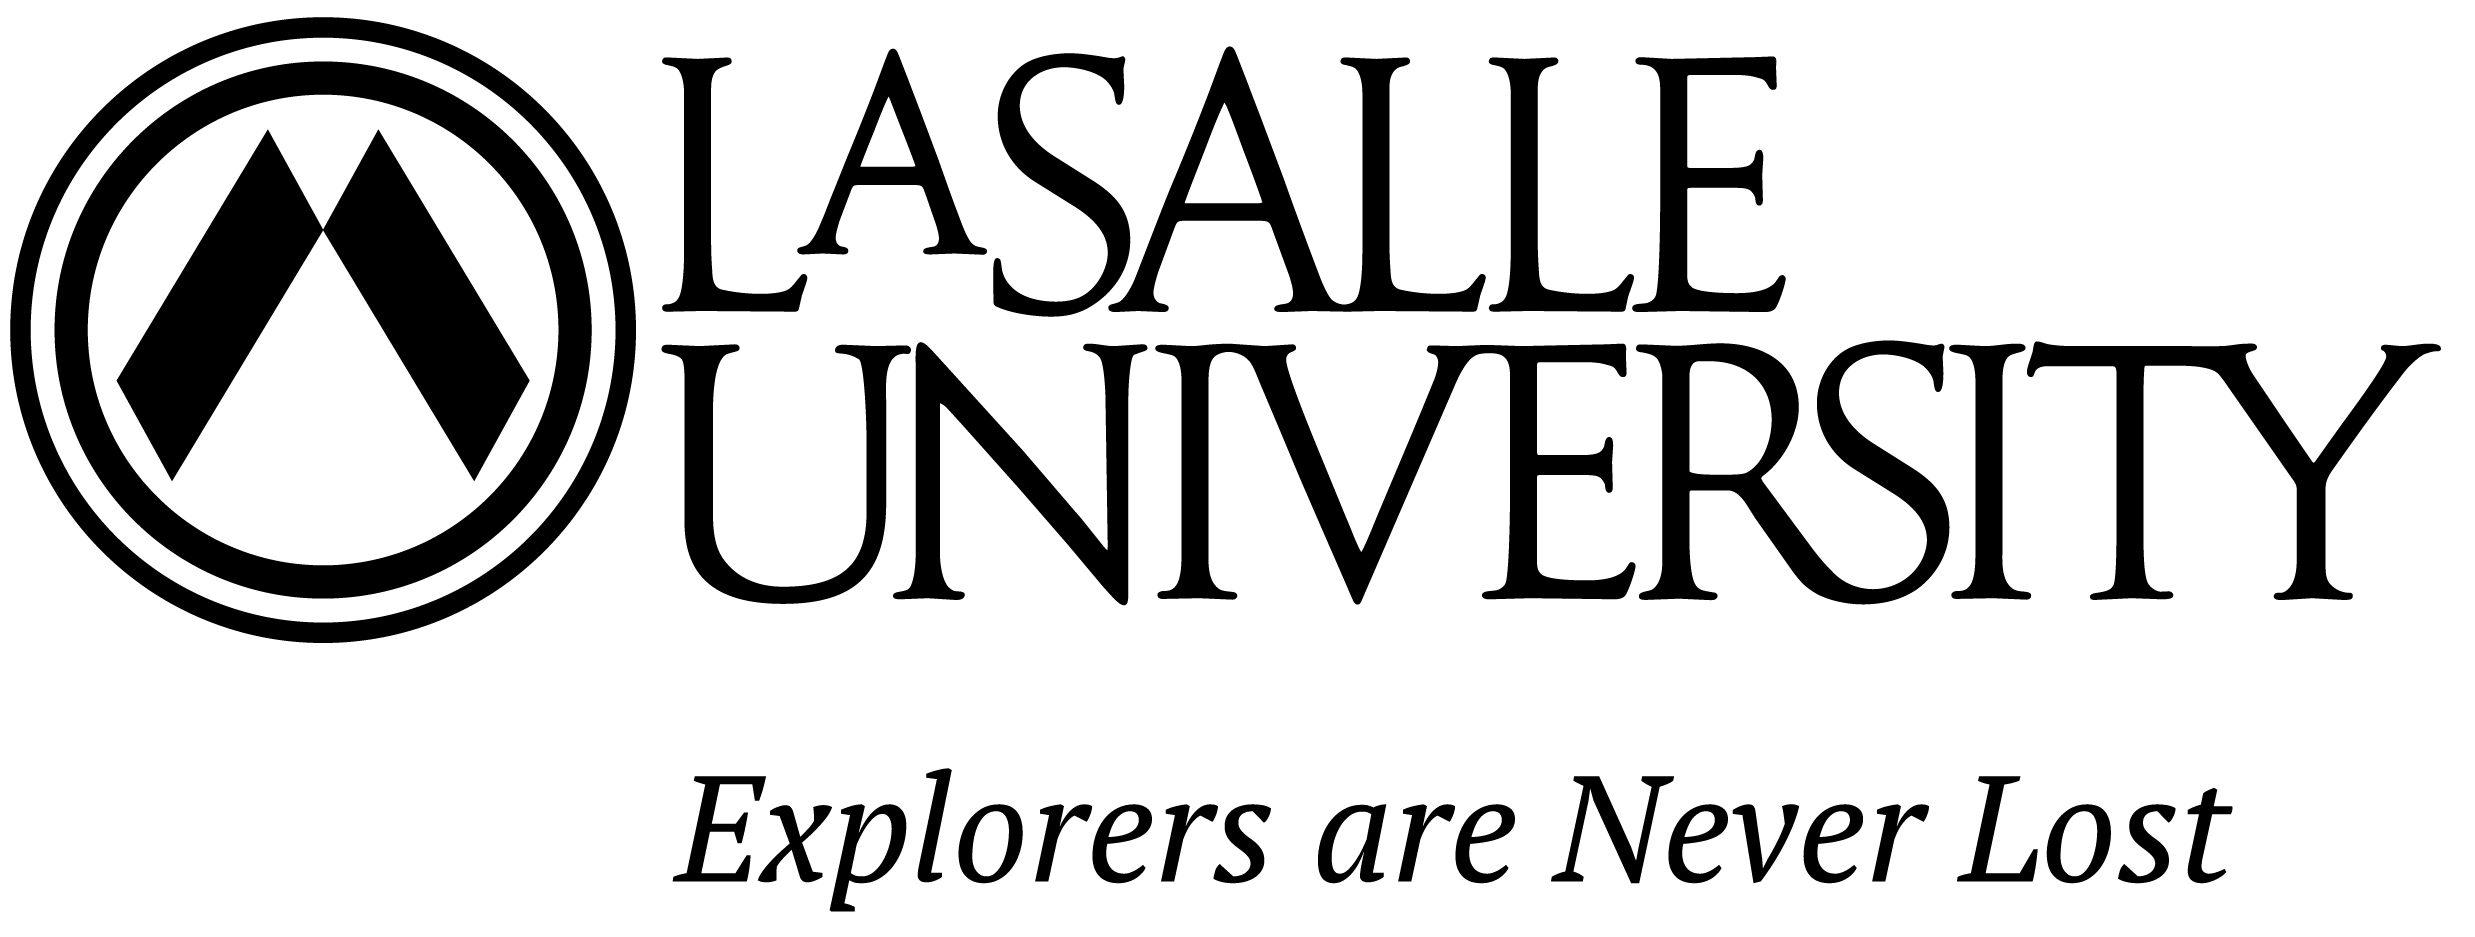 Doctorates • University Catalog 2018-19